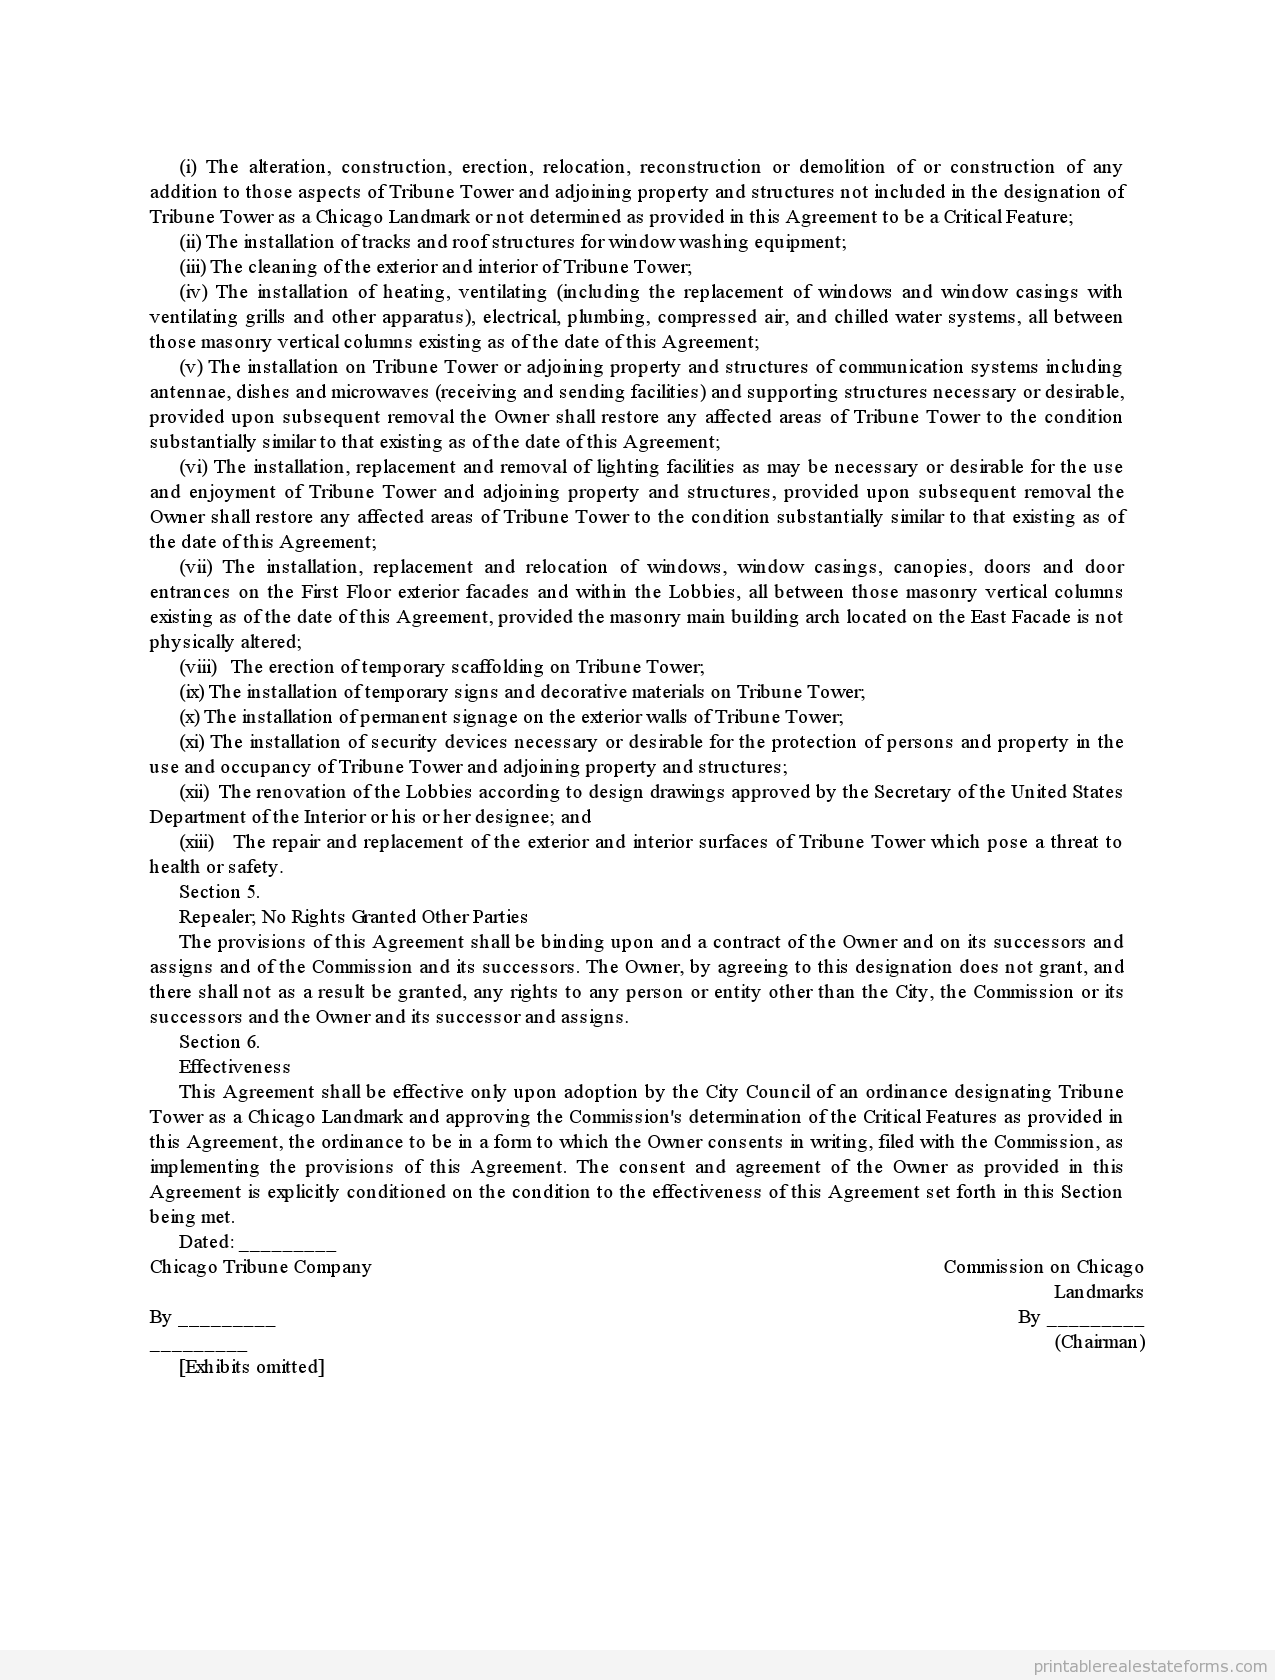 Printable Landmark Designation Agreement Tribune Tower Chicago